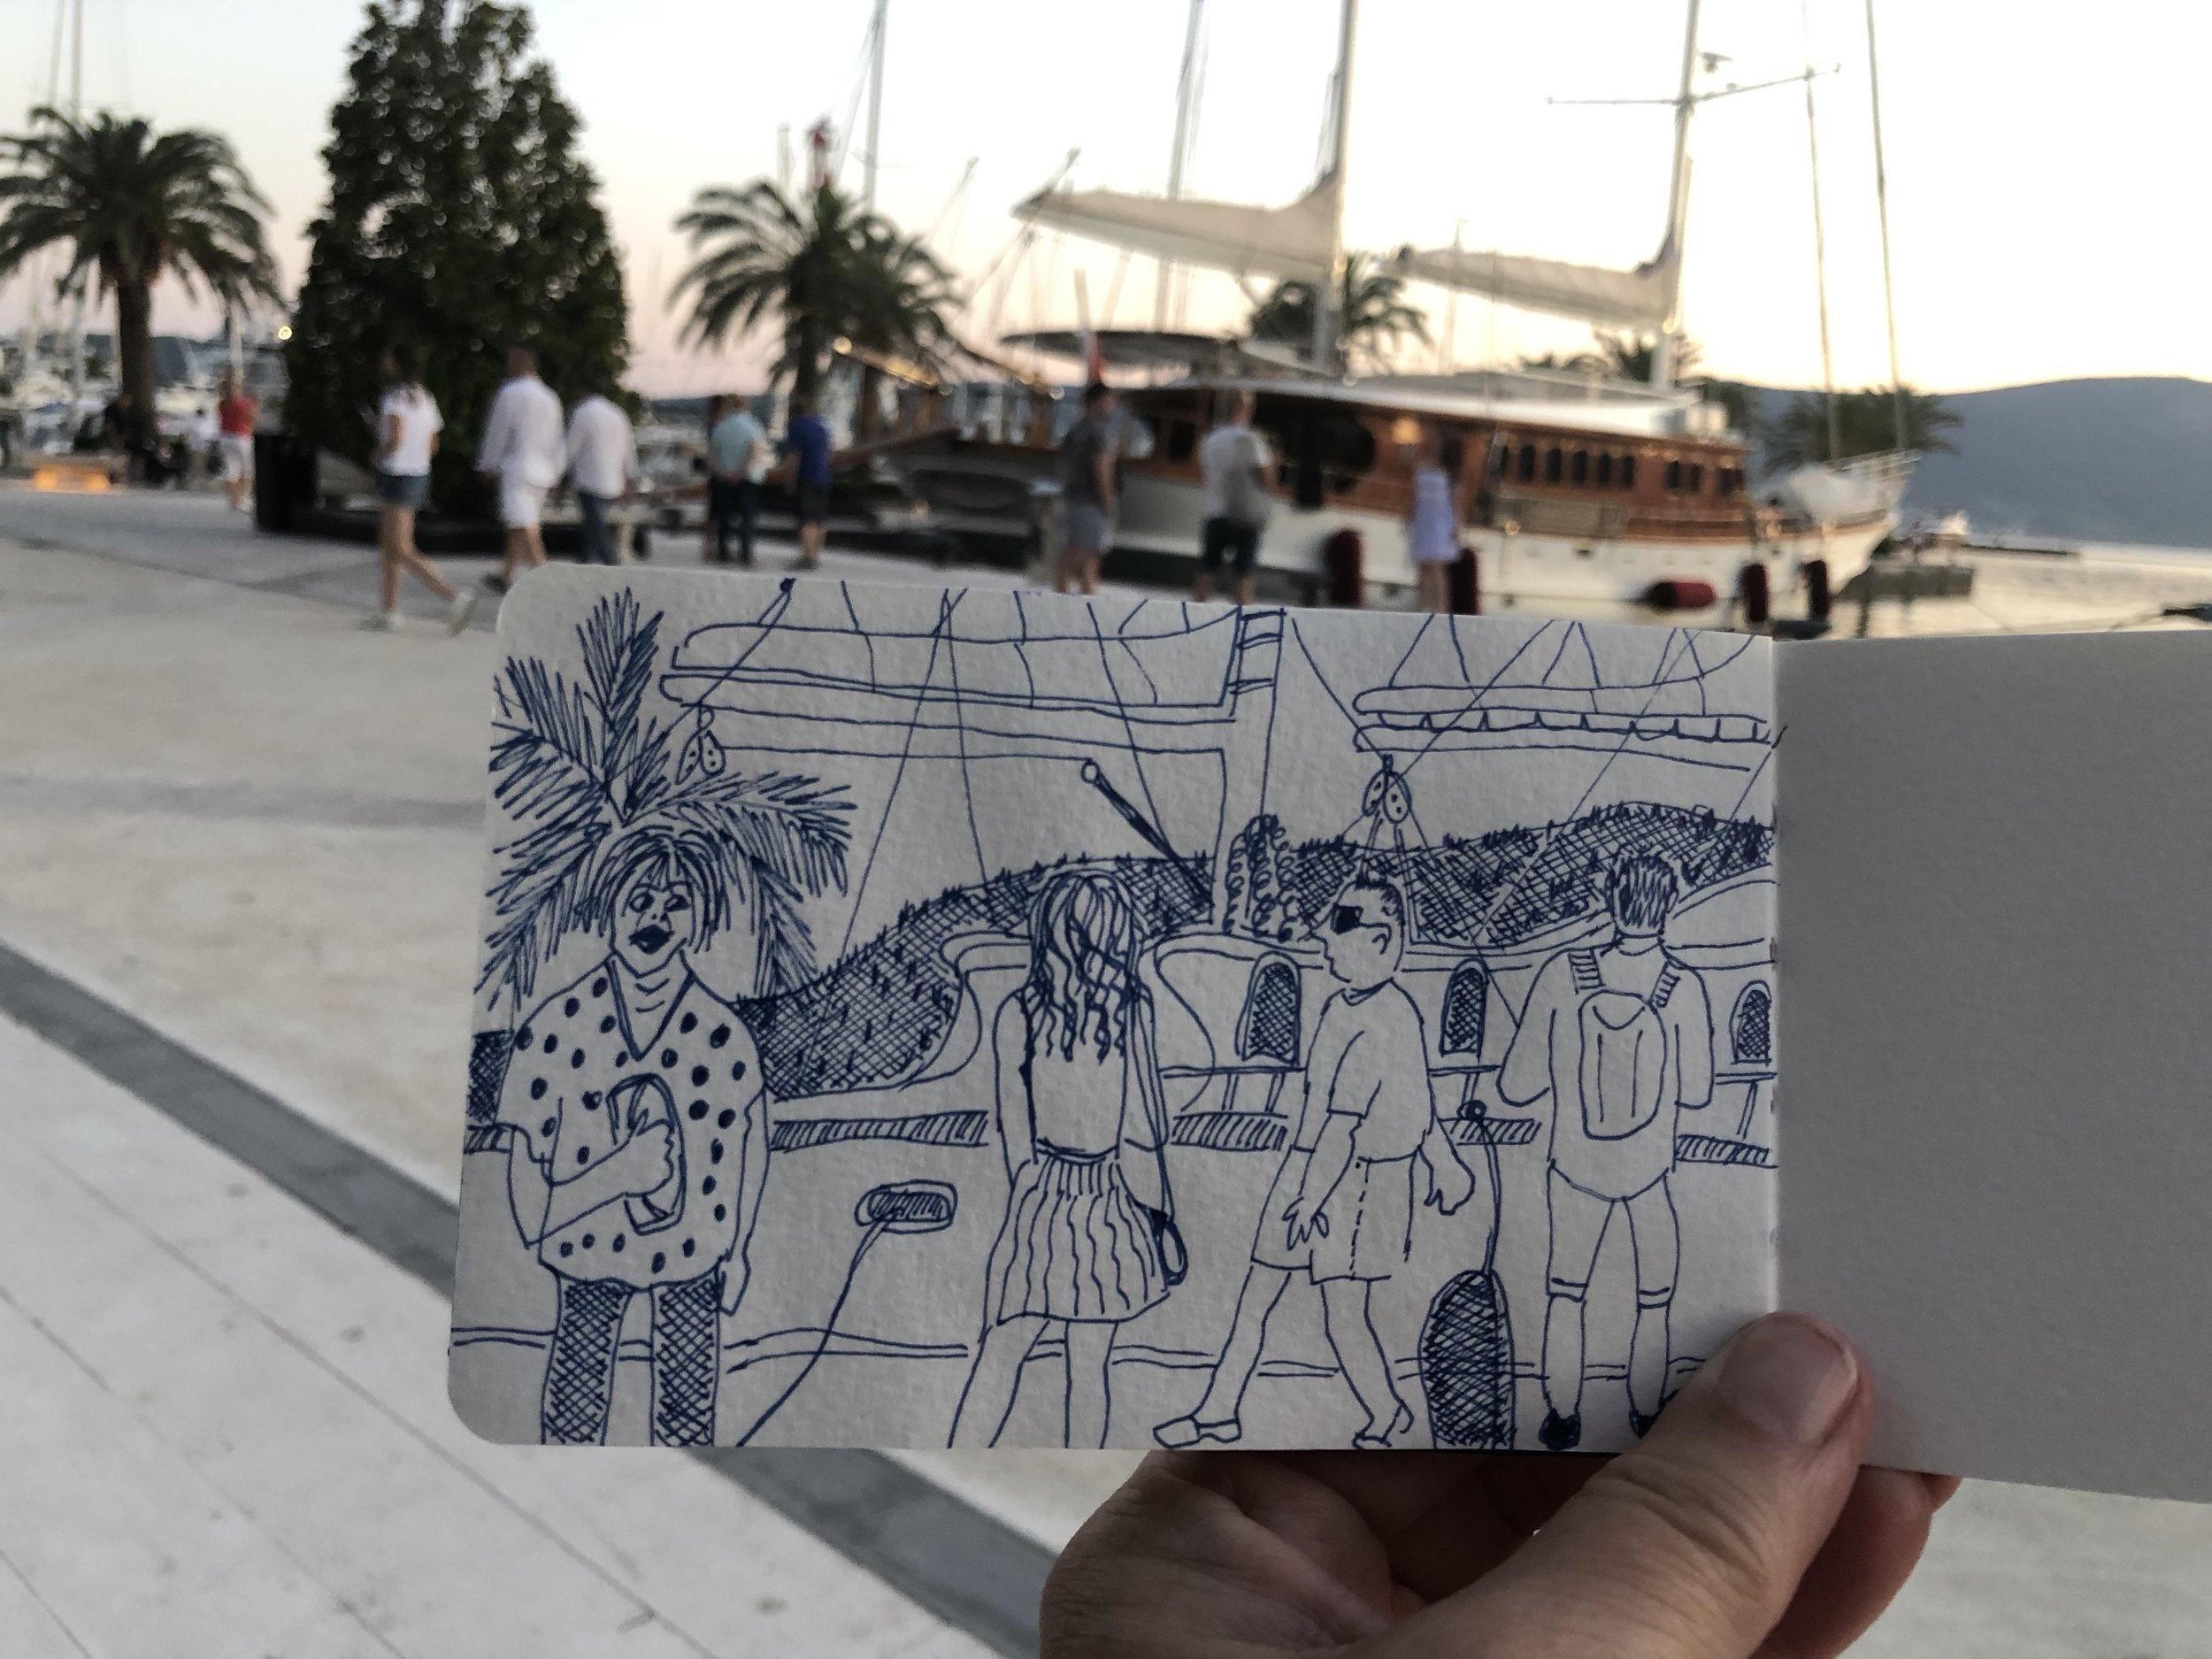 Porto Montenegro passing parade